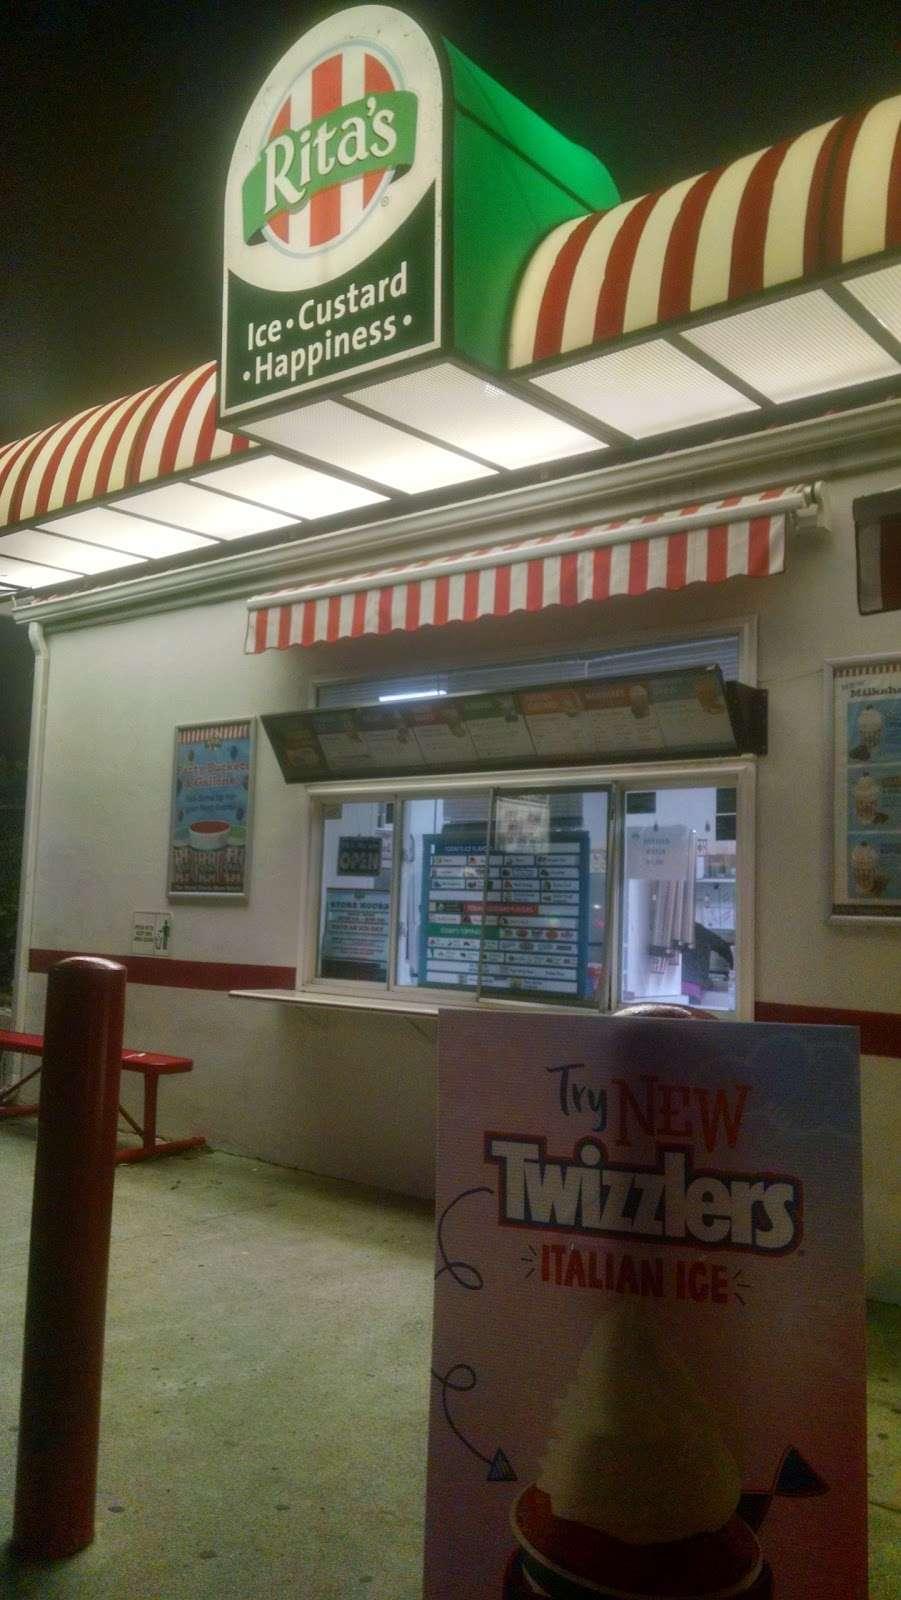 Ritas Italian Ice - store    Photo 9 of 10   Address: 50 River Rd, North Arlington, NJ 07031, USA   Phone: (201) 428-1356